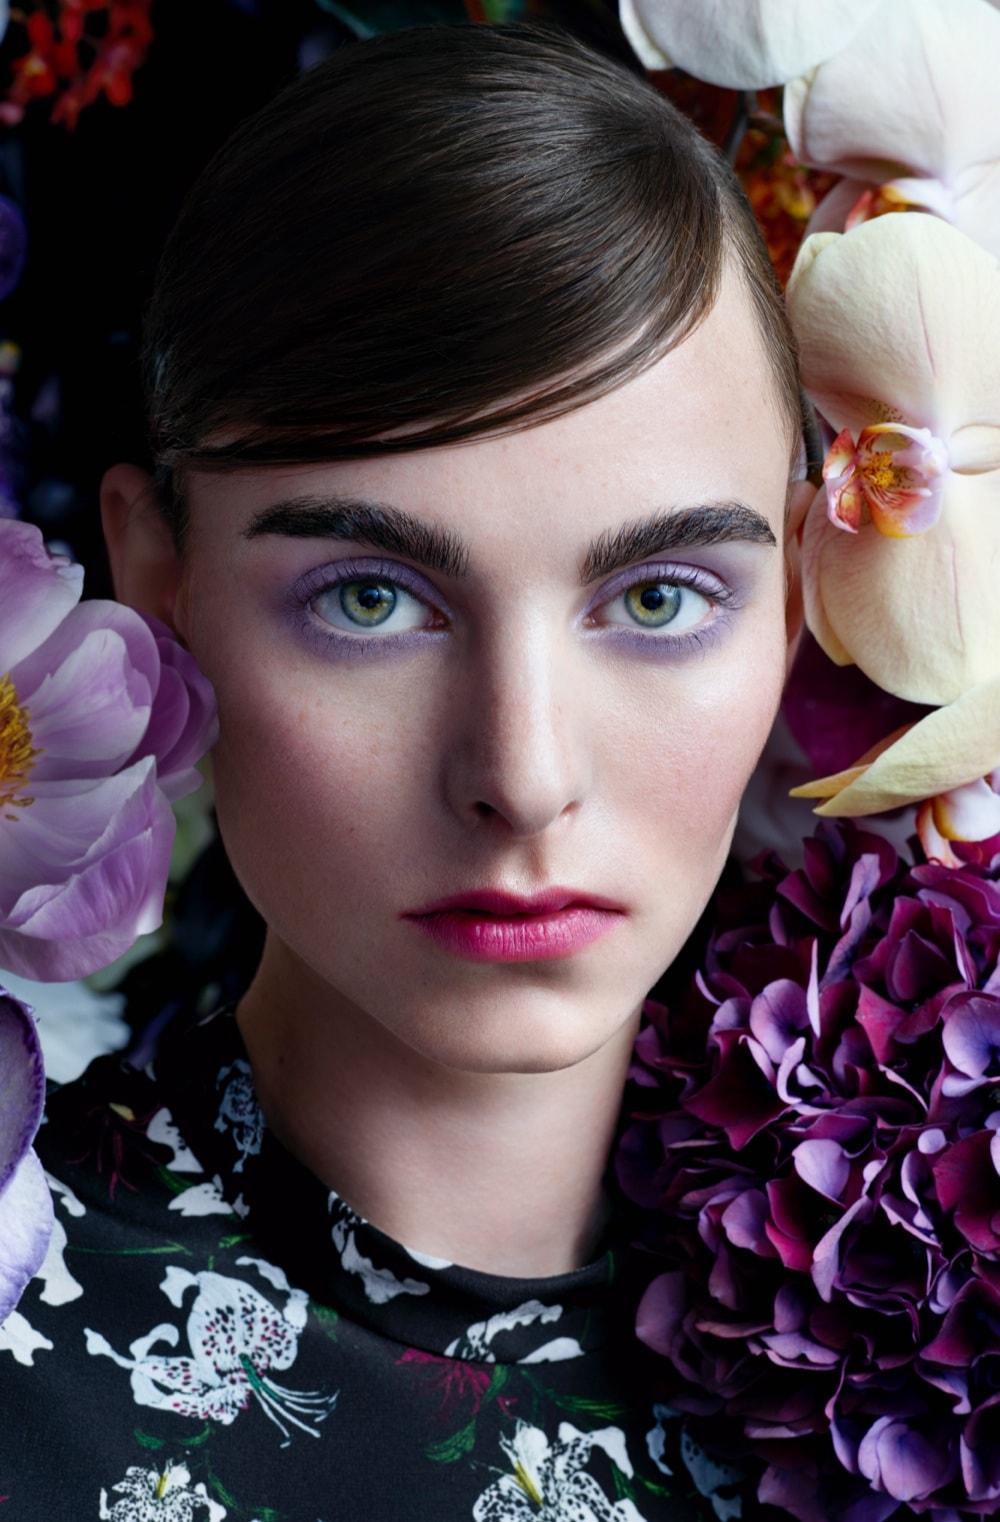 Erdem for NARS Strange Flowers Collection – Lead Campaign Image